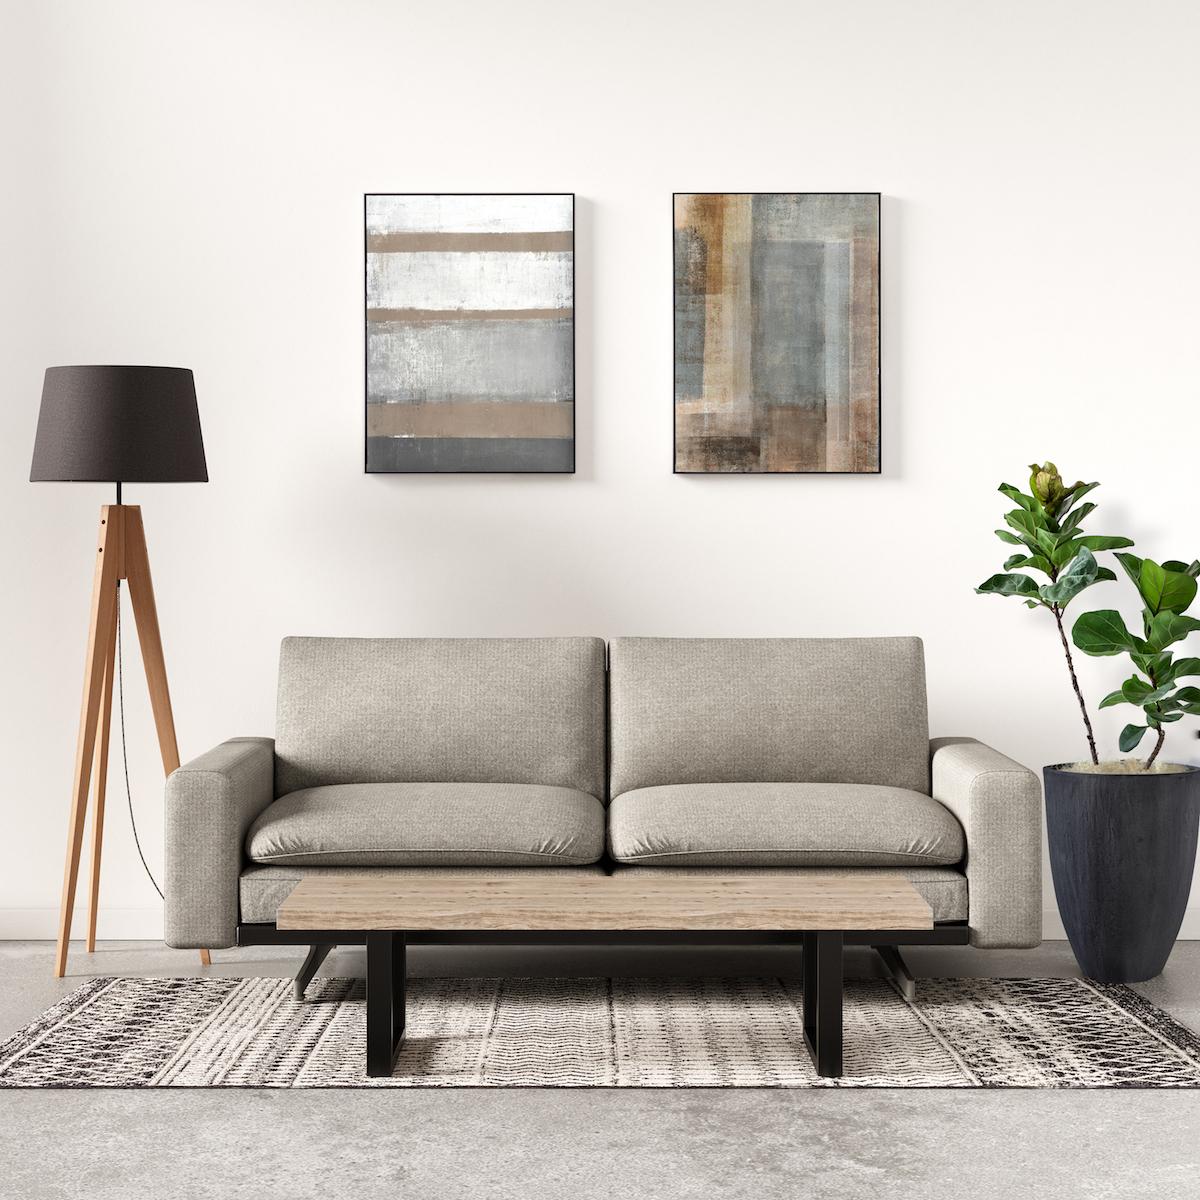 Project 06 - Living Room - Set 02 - 2.2.jpg